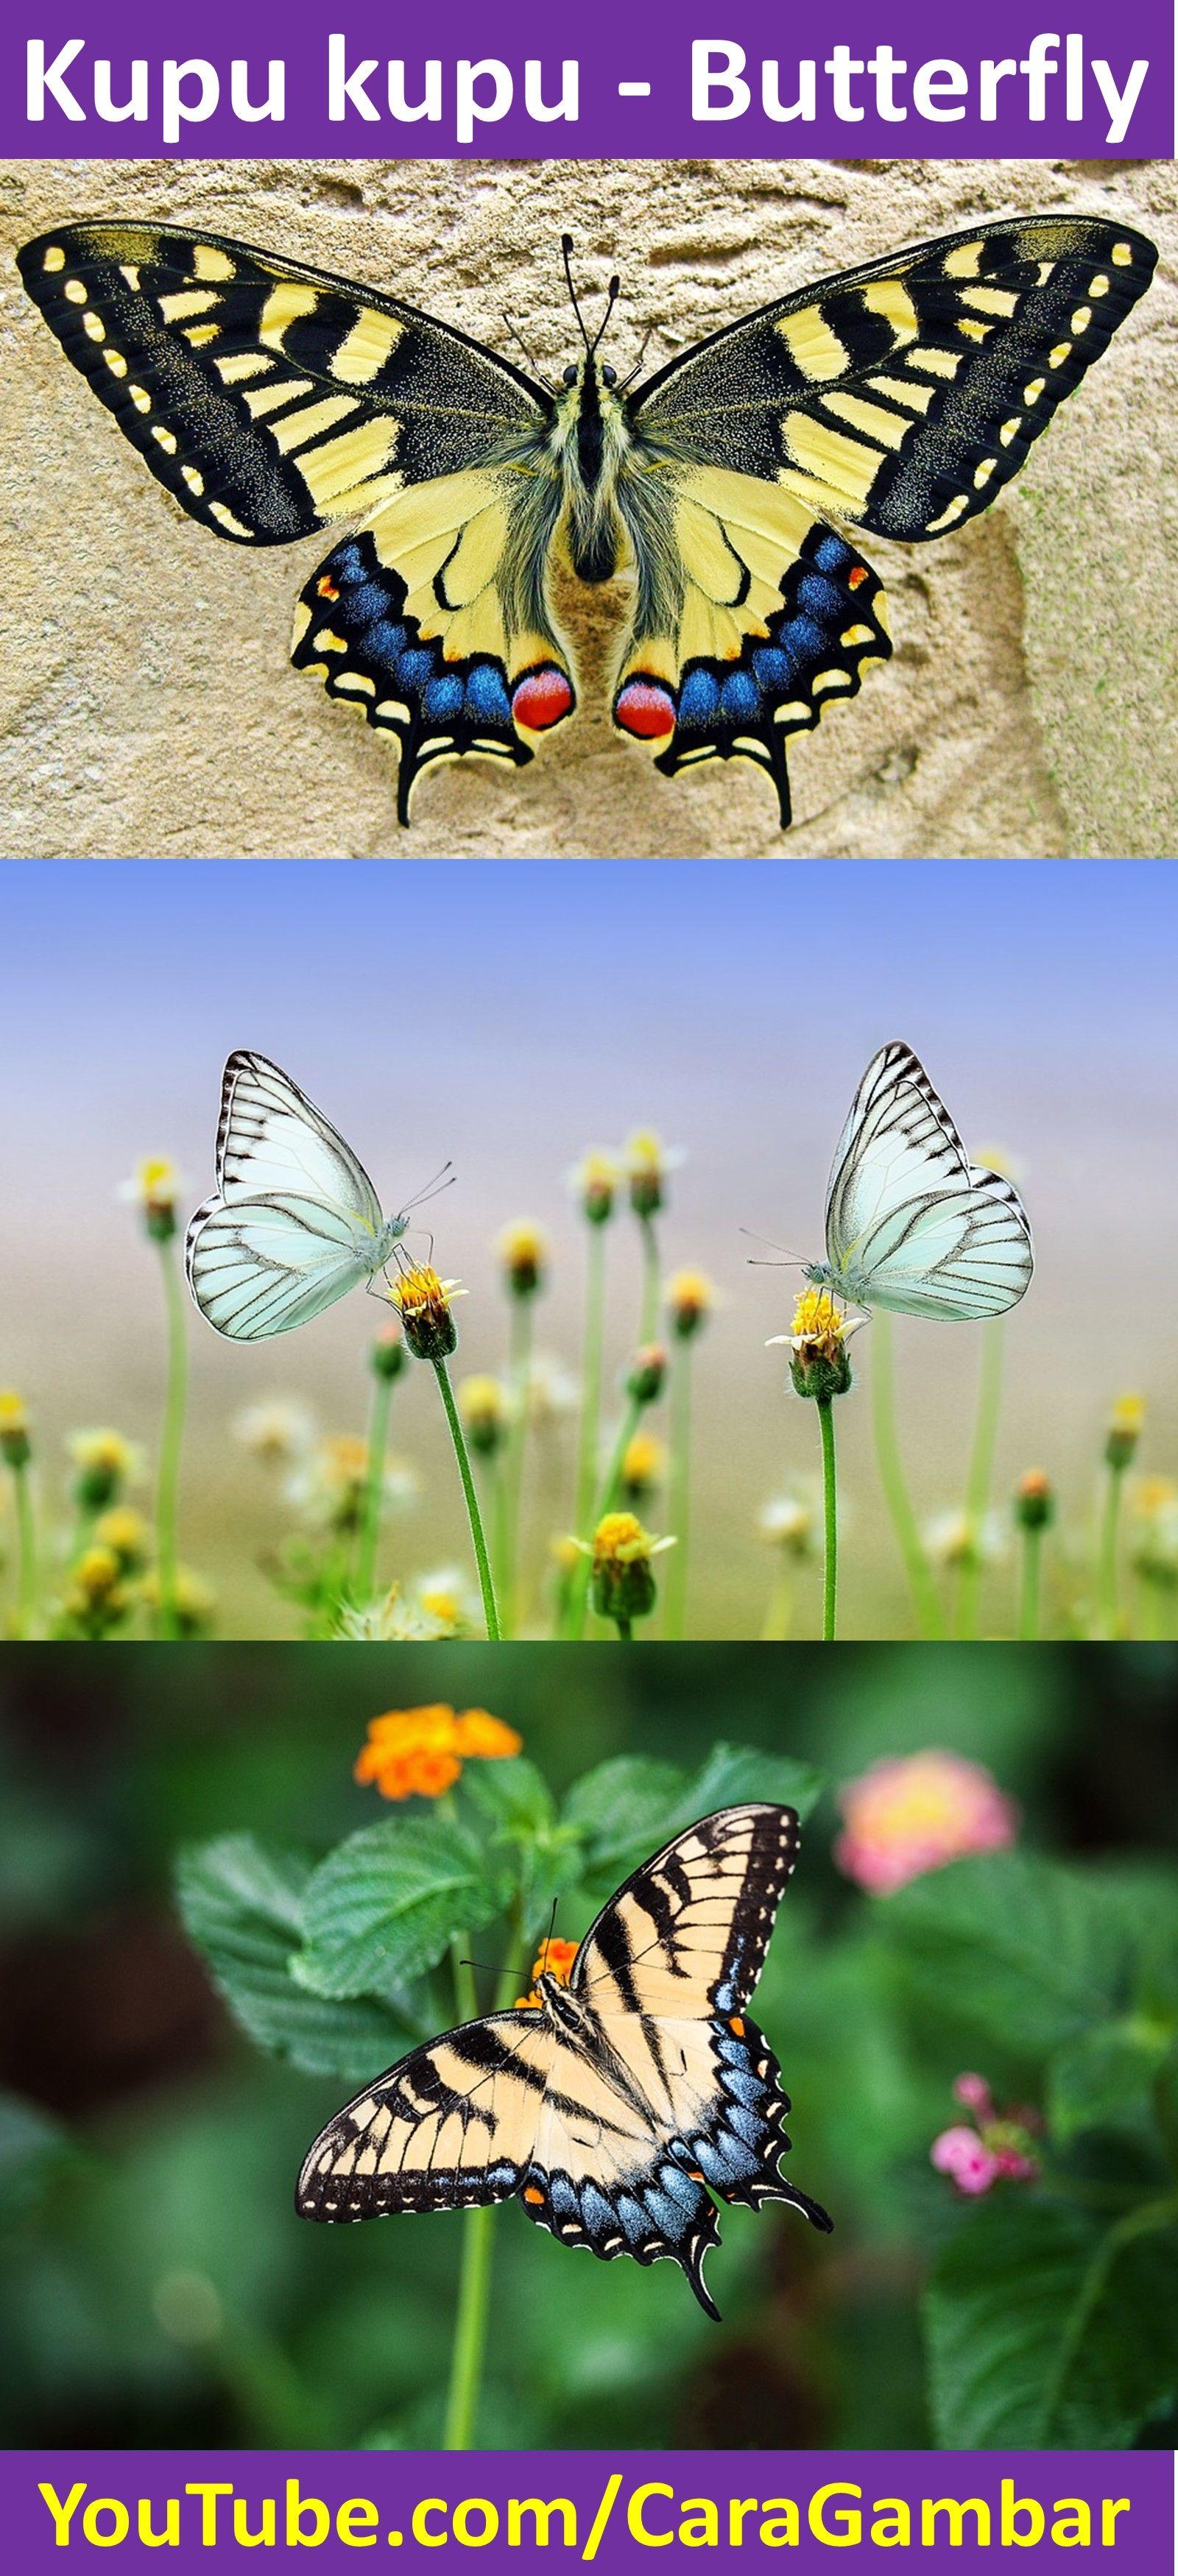 980 Gambar Binatang Yang Simple HD Terbaru